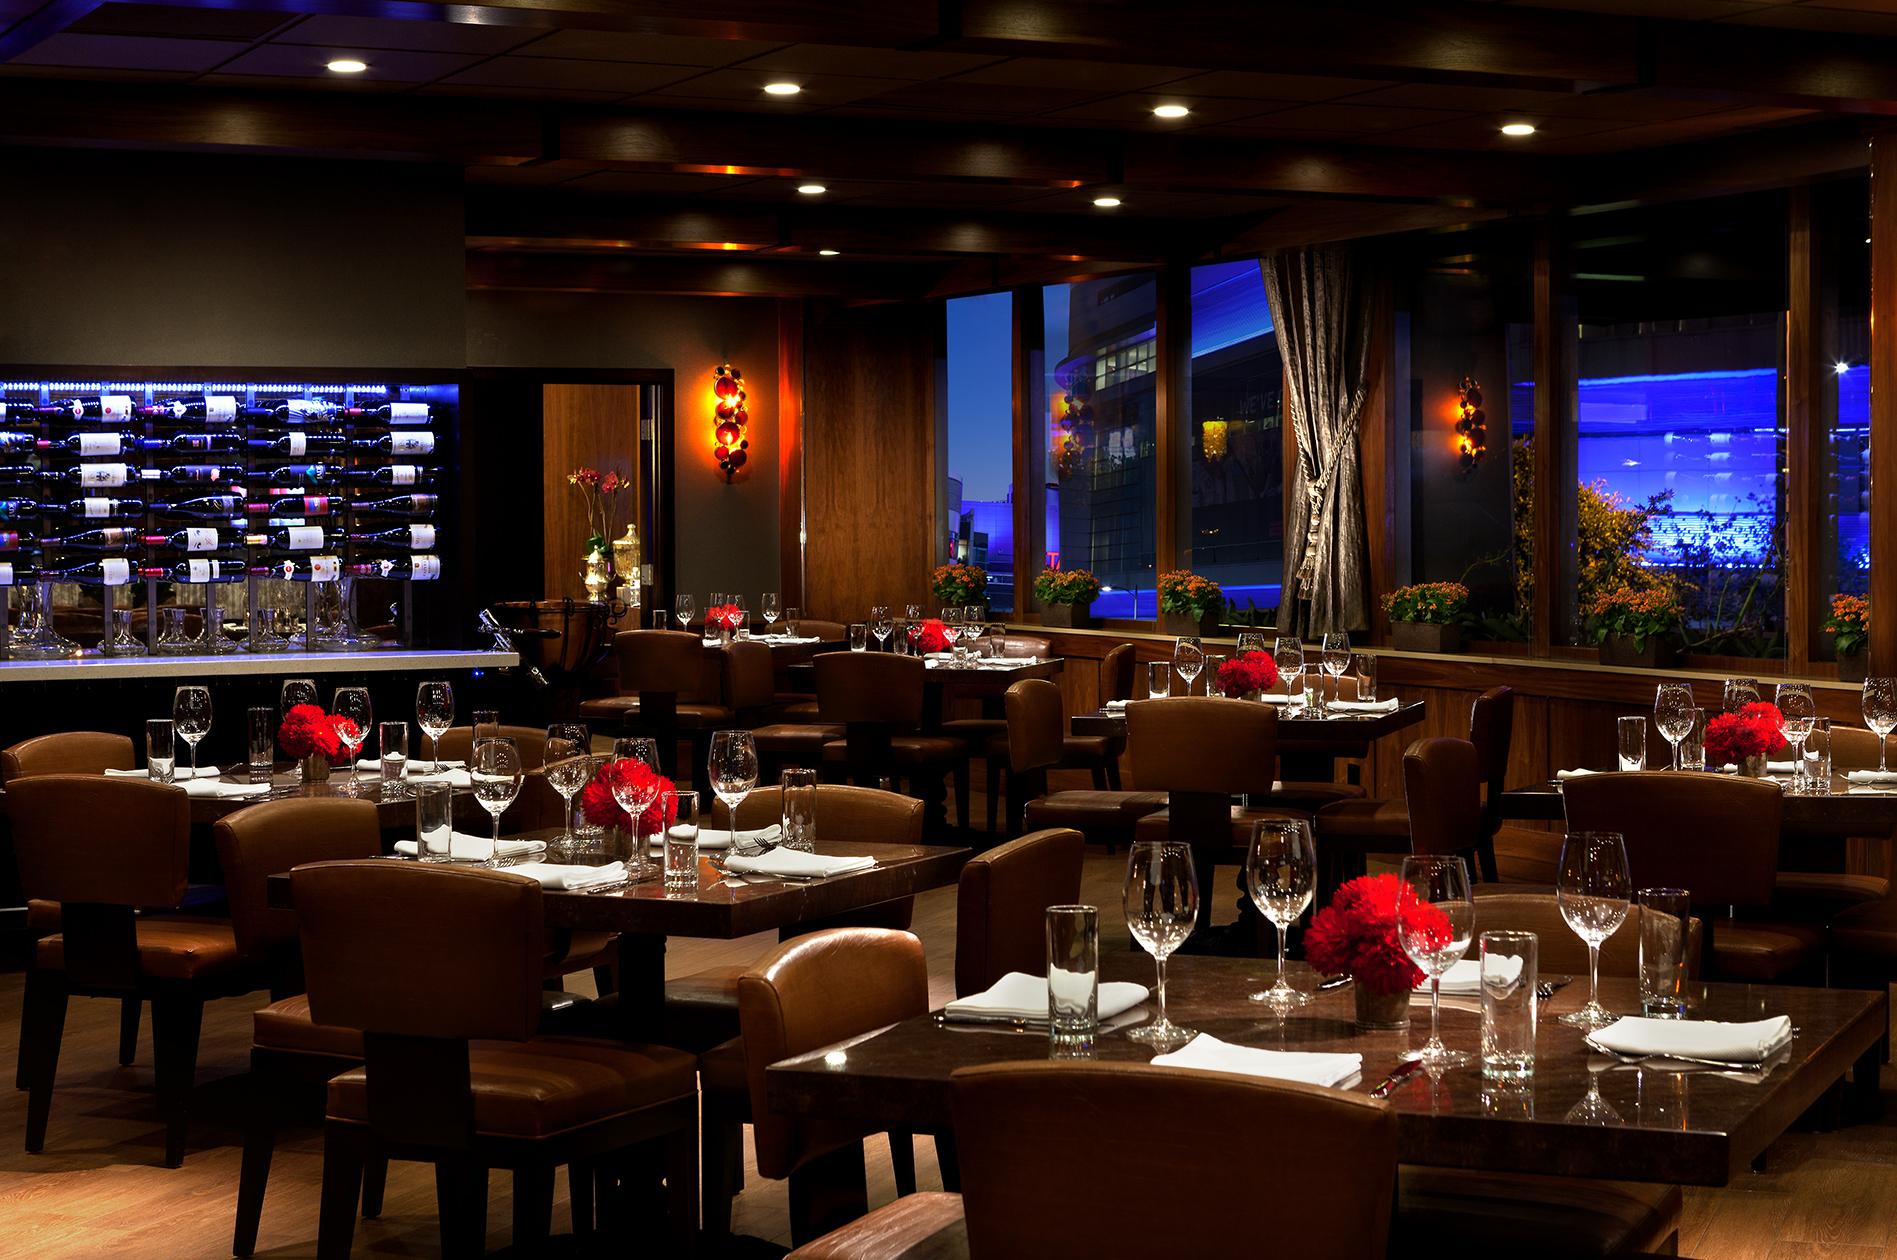 FigOly Restaurant